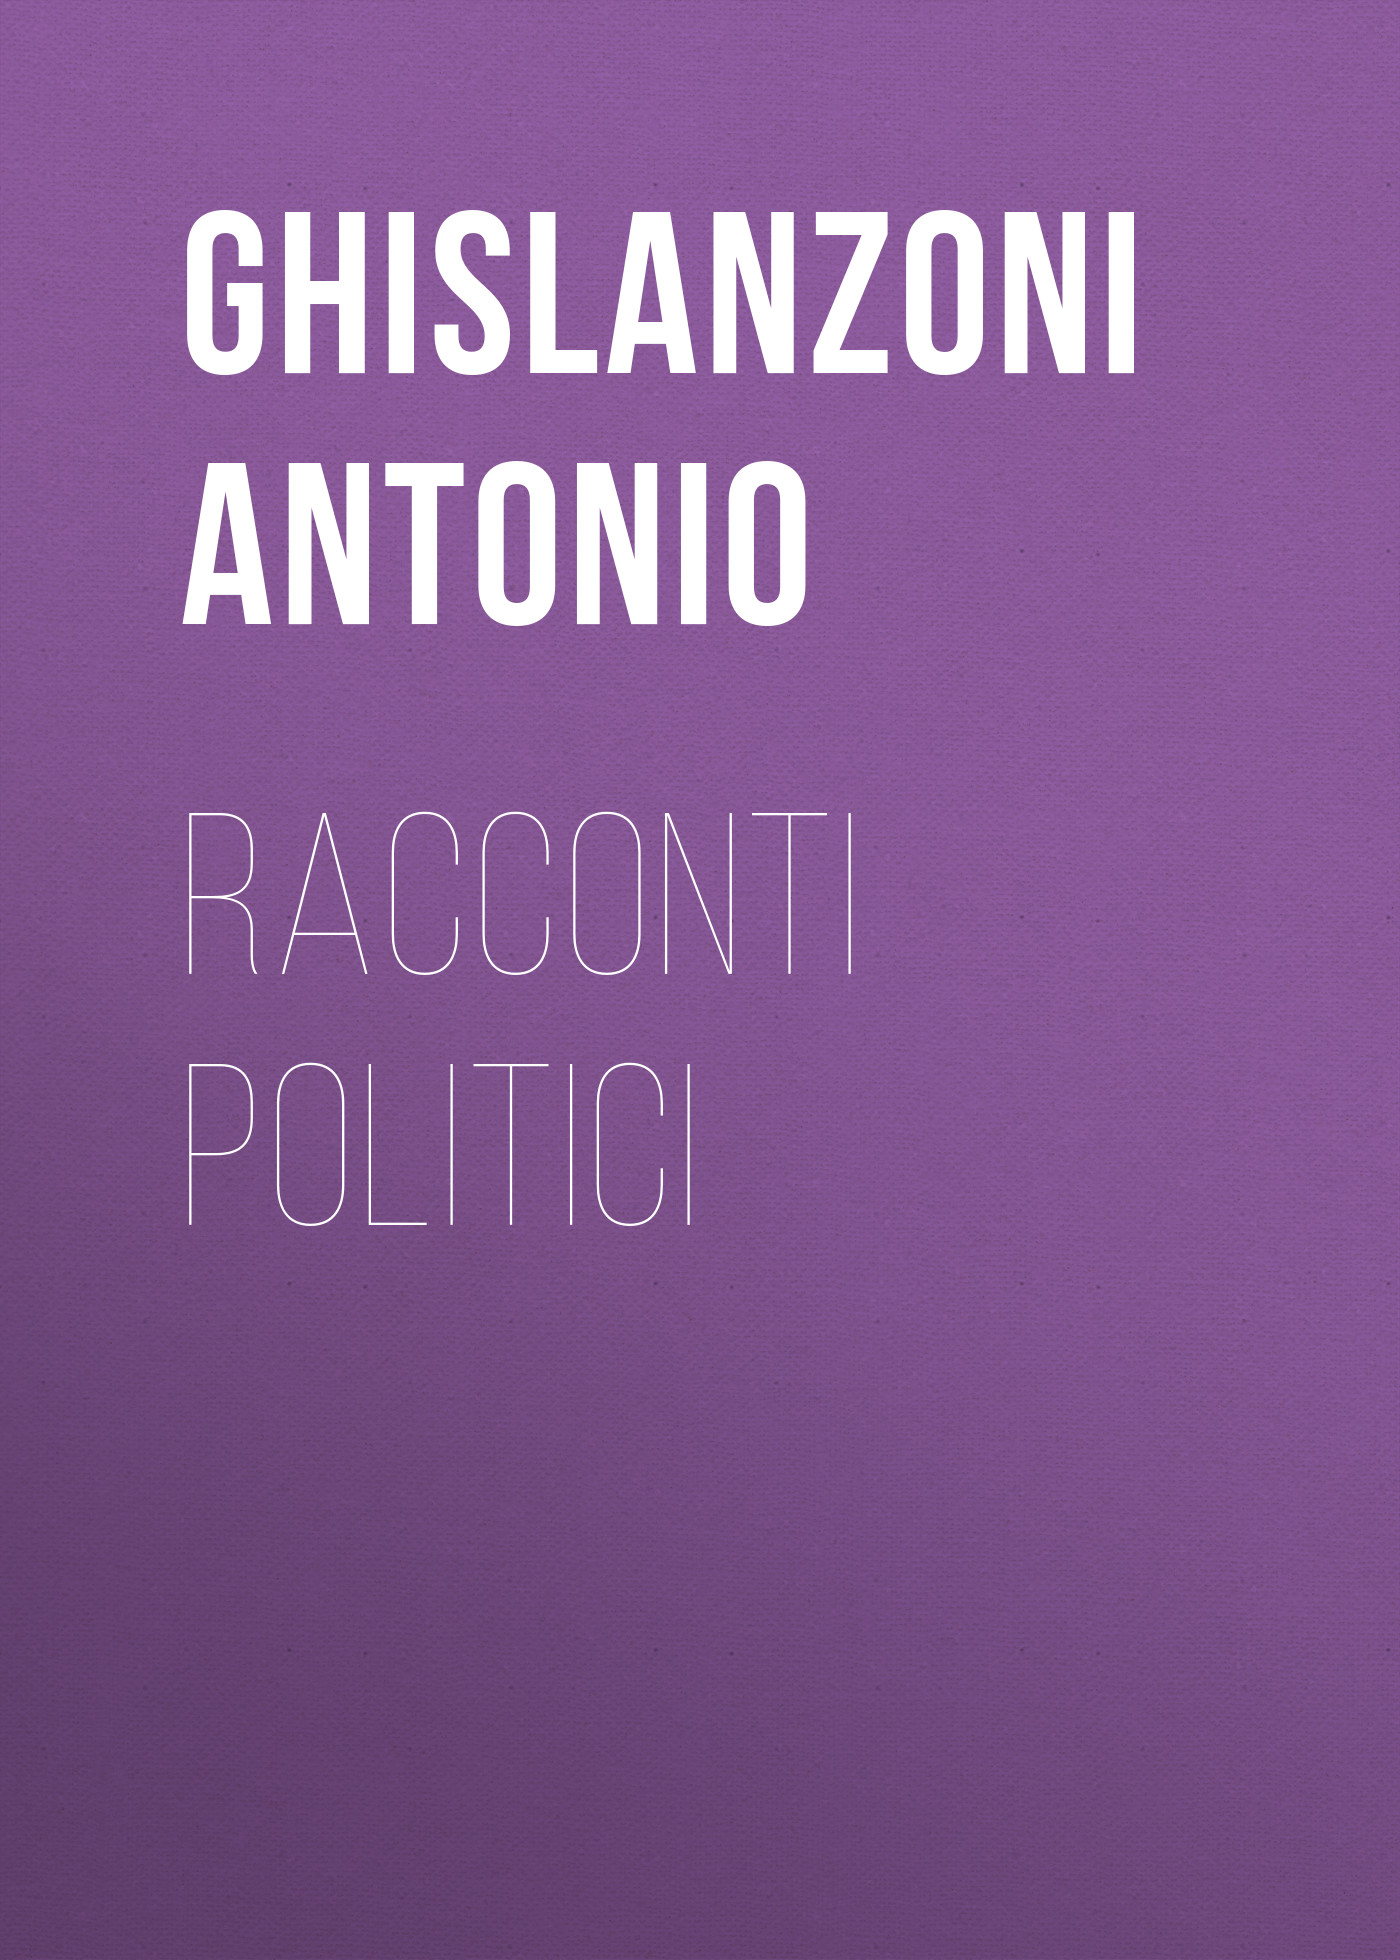 Ghislanzoni Antonio Racconti politici цены